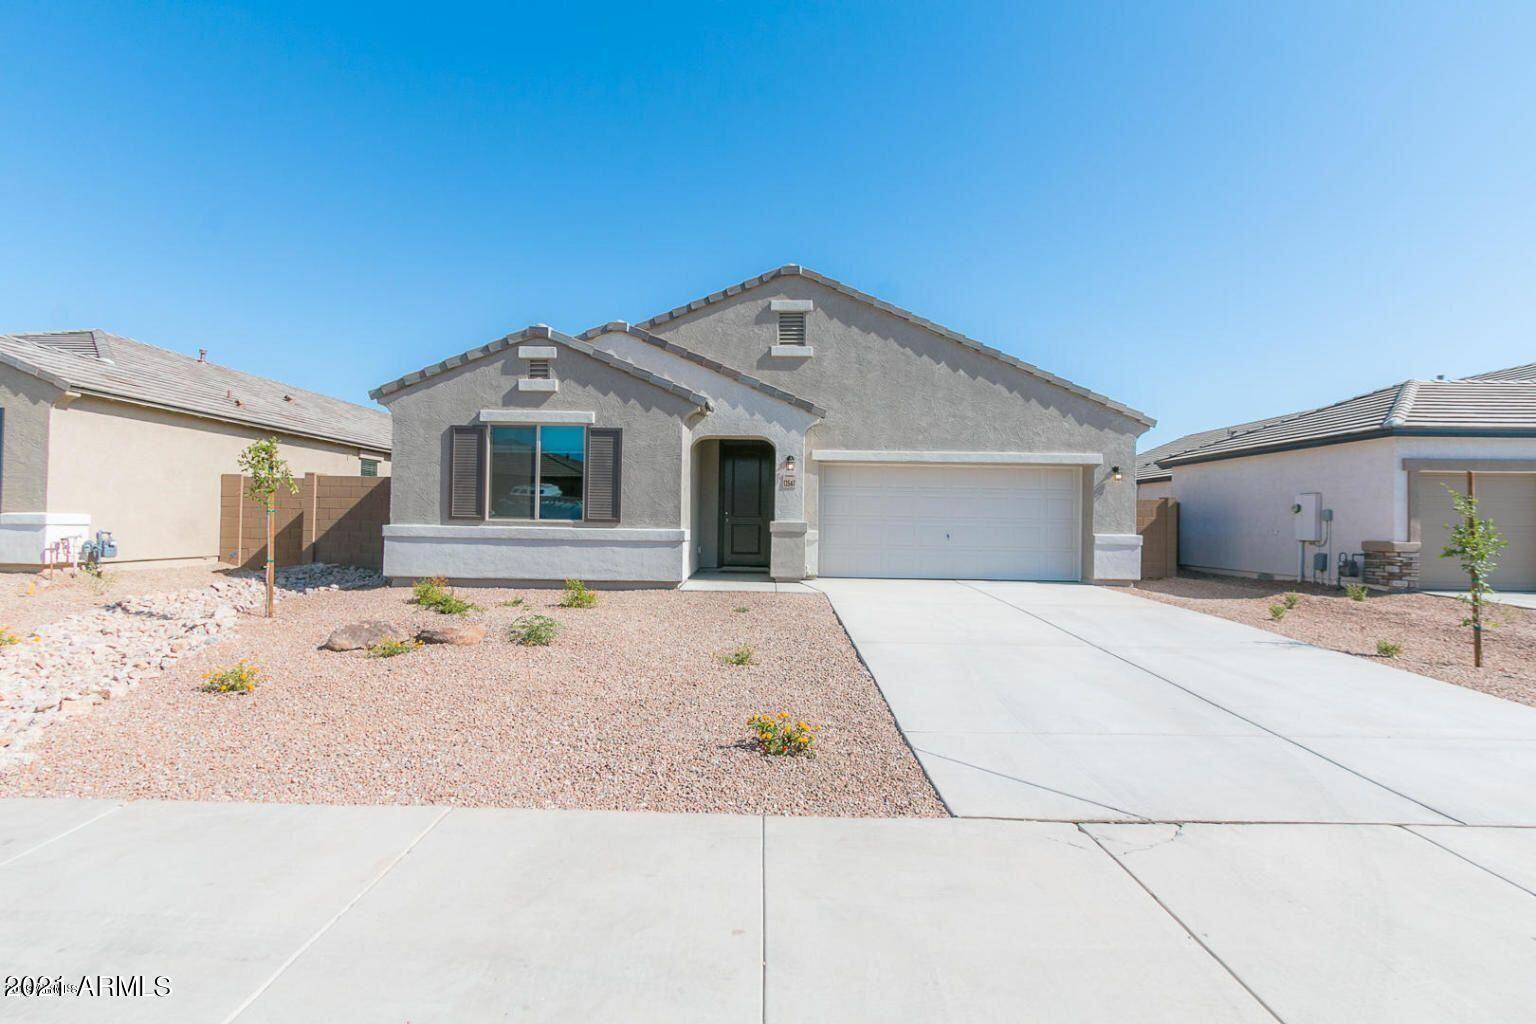 13547 W Remuda Drive, Peoria, AZ 85383 - MLS#: 6248221